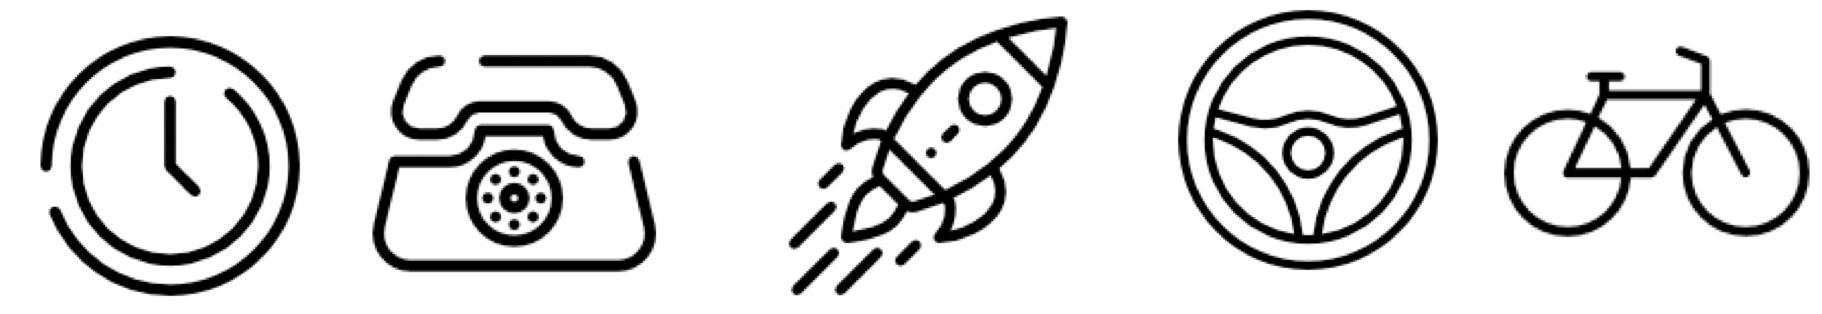 illustration_icnons2